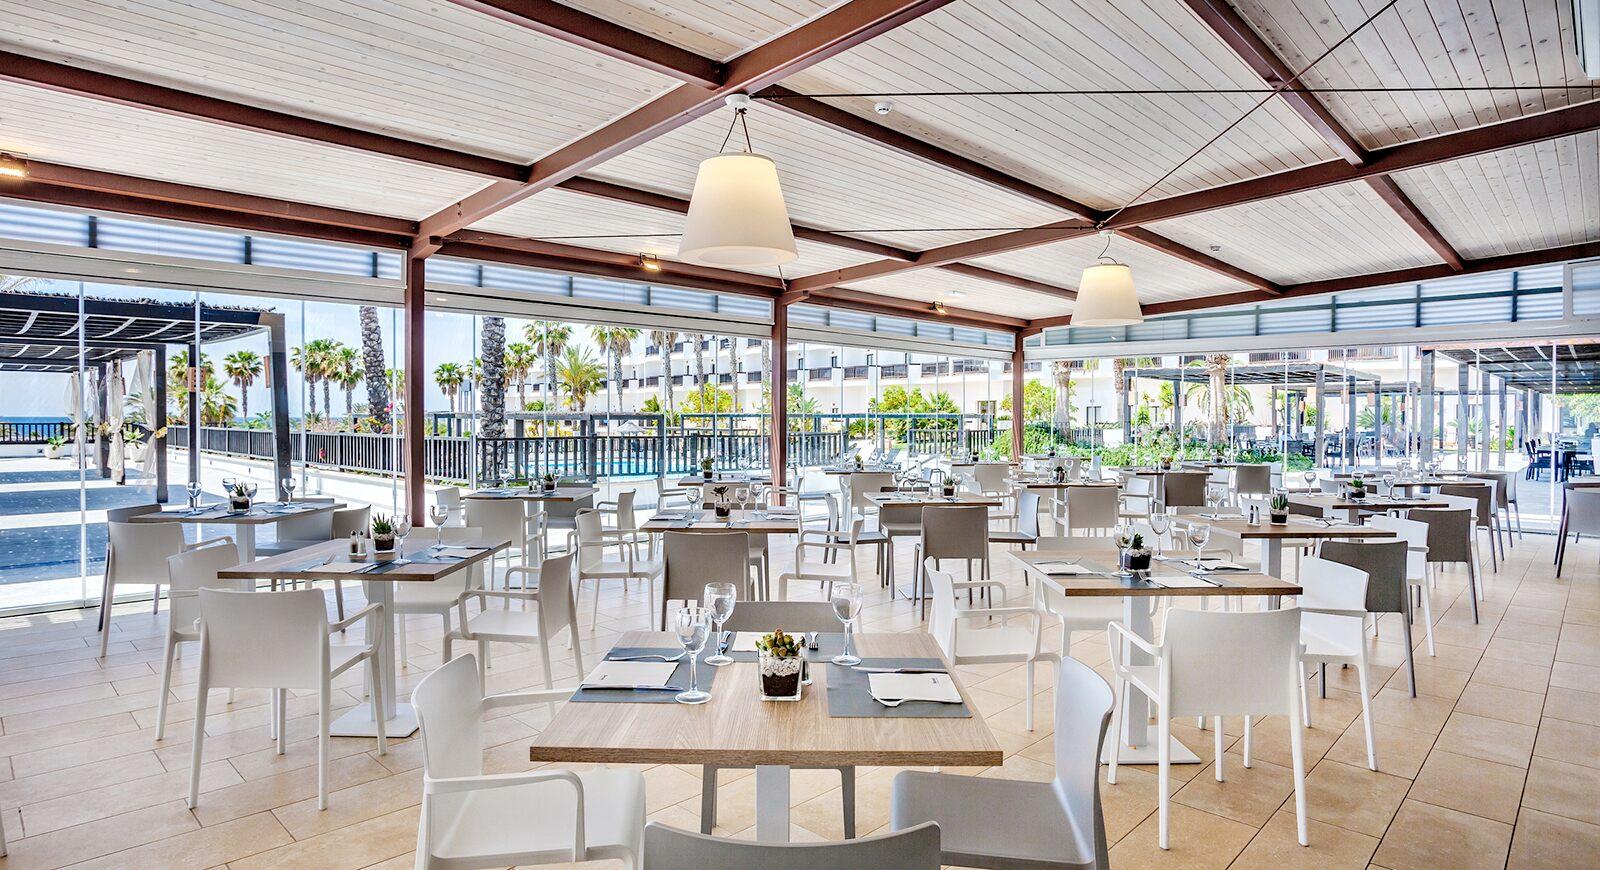 236-restaurant-117-hotel-barcelo-cabo-de-gata_tcm20-136686_w1600_h870_n.jpg